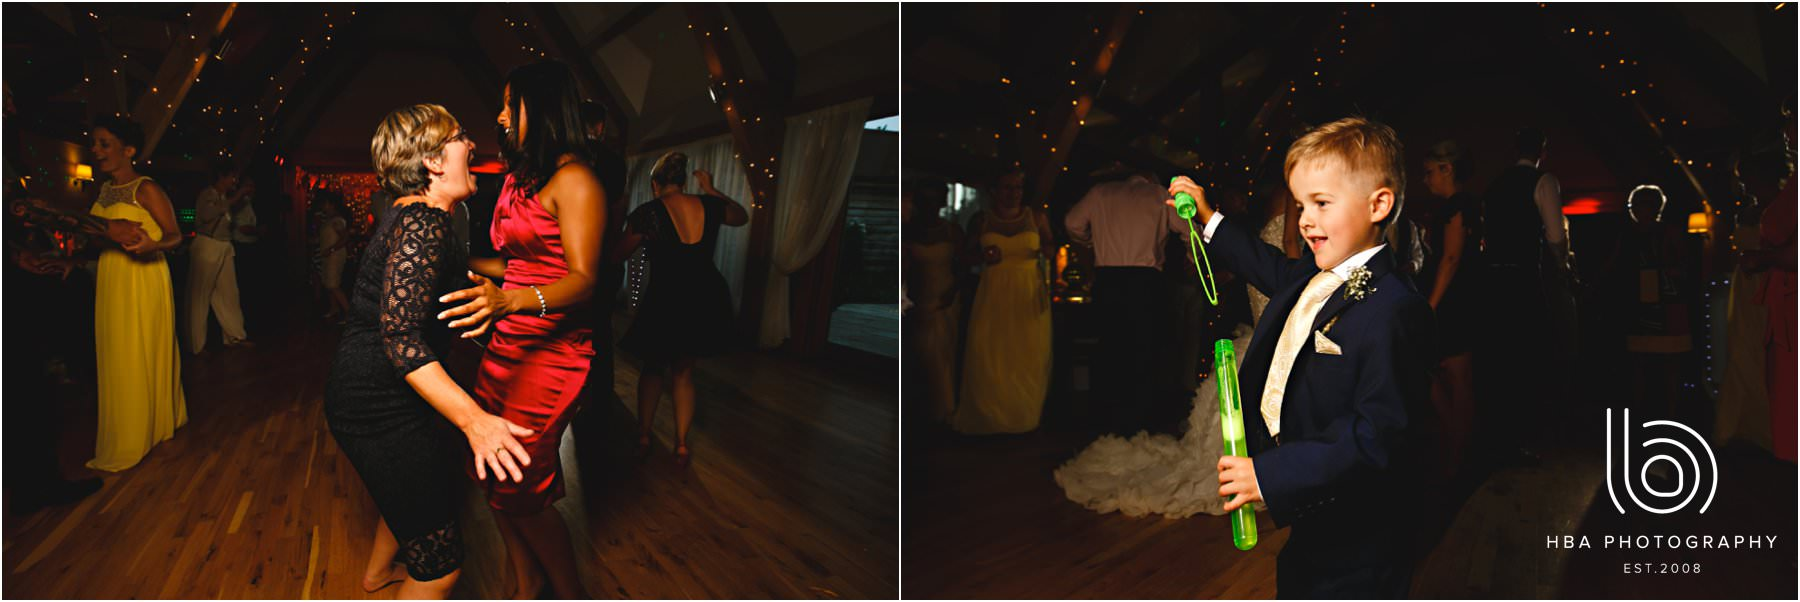 the wedding guests dancing